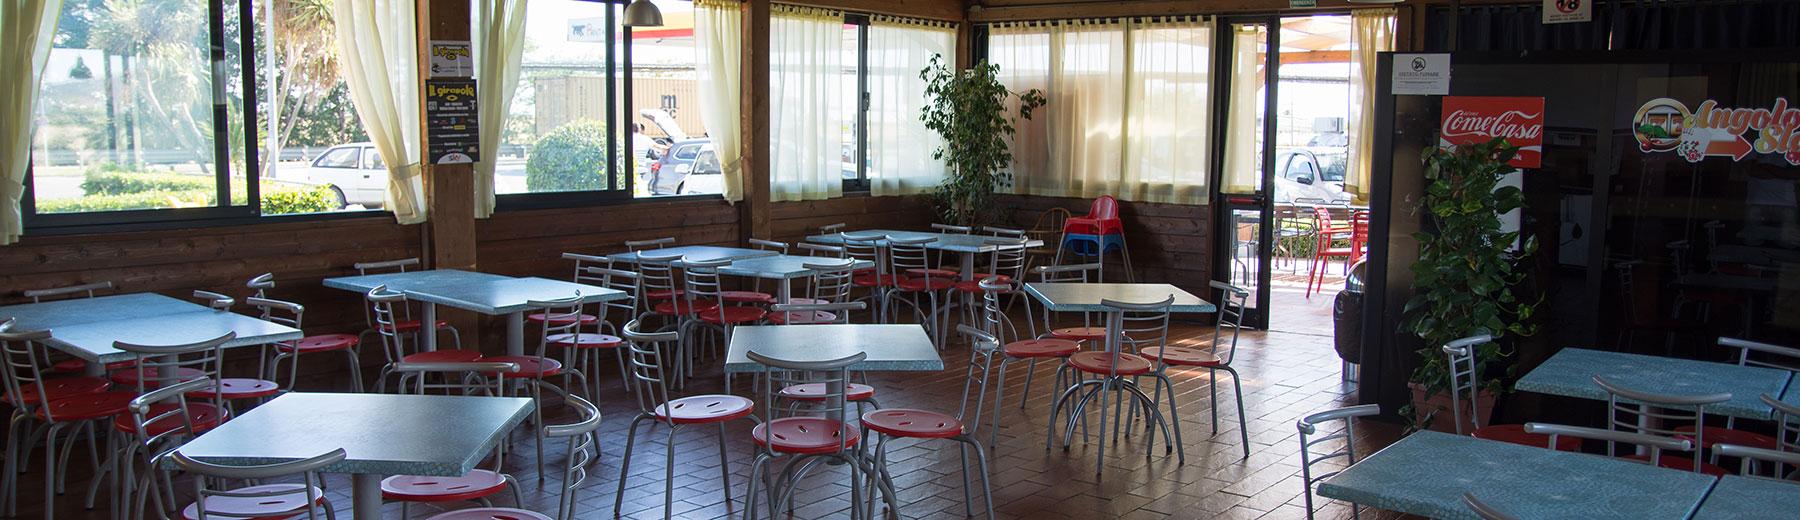 bar-tavola-calda-girasole-capalbio-21